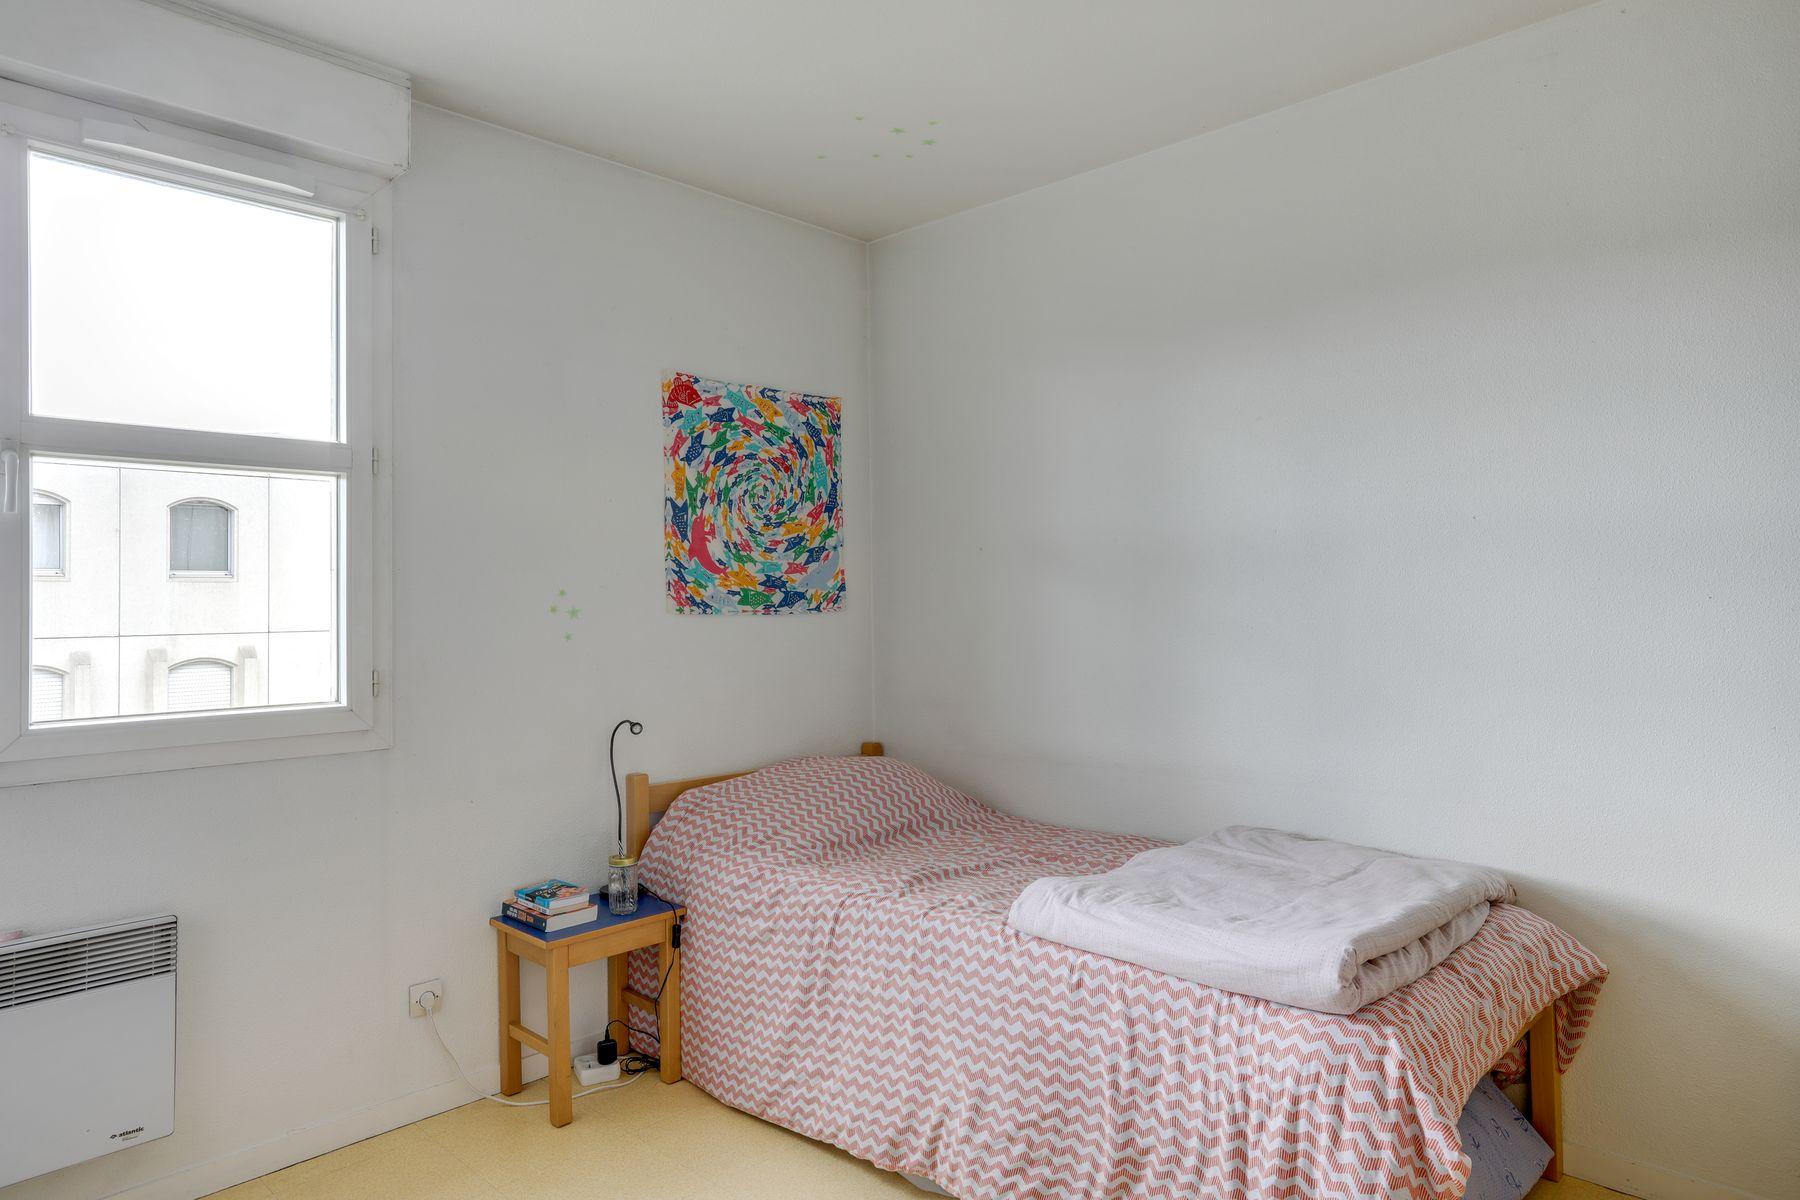 LOGIFAC résidence étudiante Gambetta Rouen lit